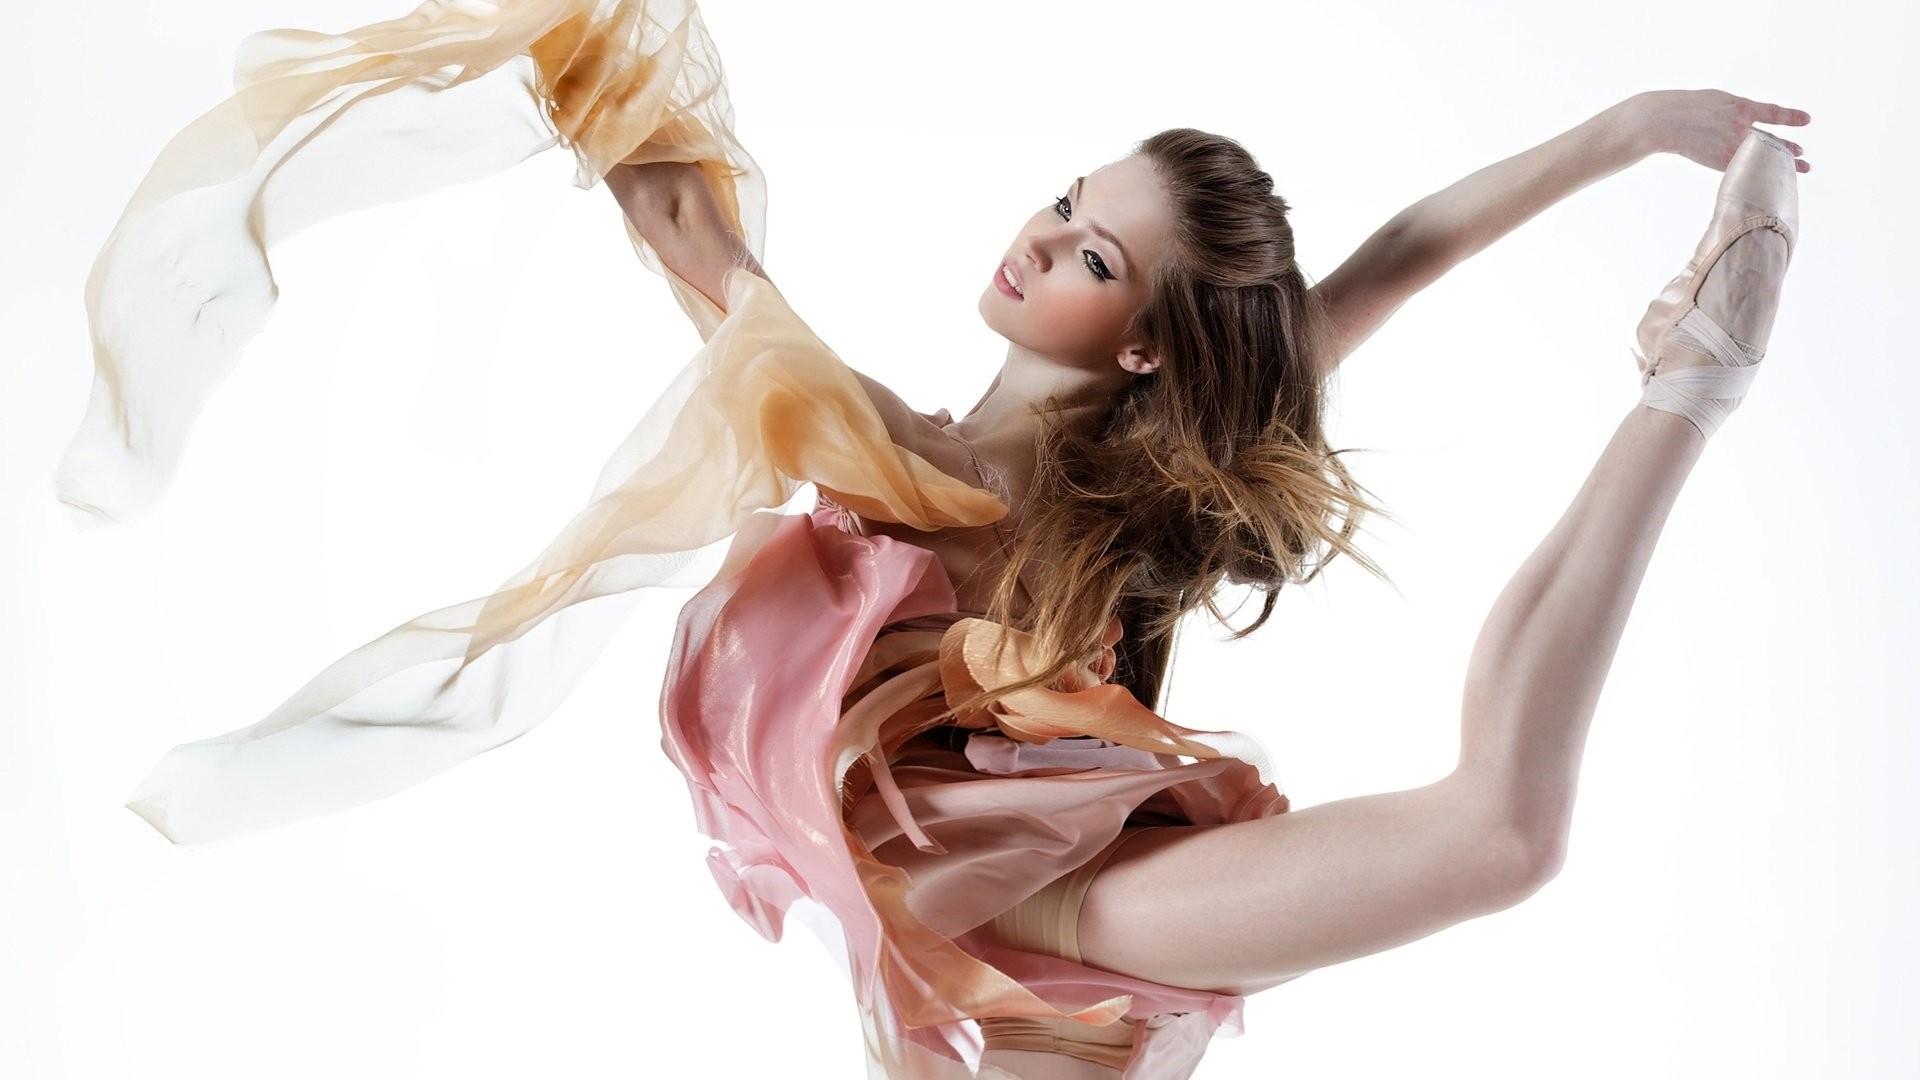 Dance Background Wallpaper